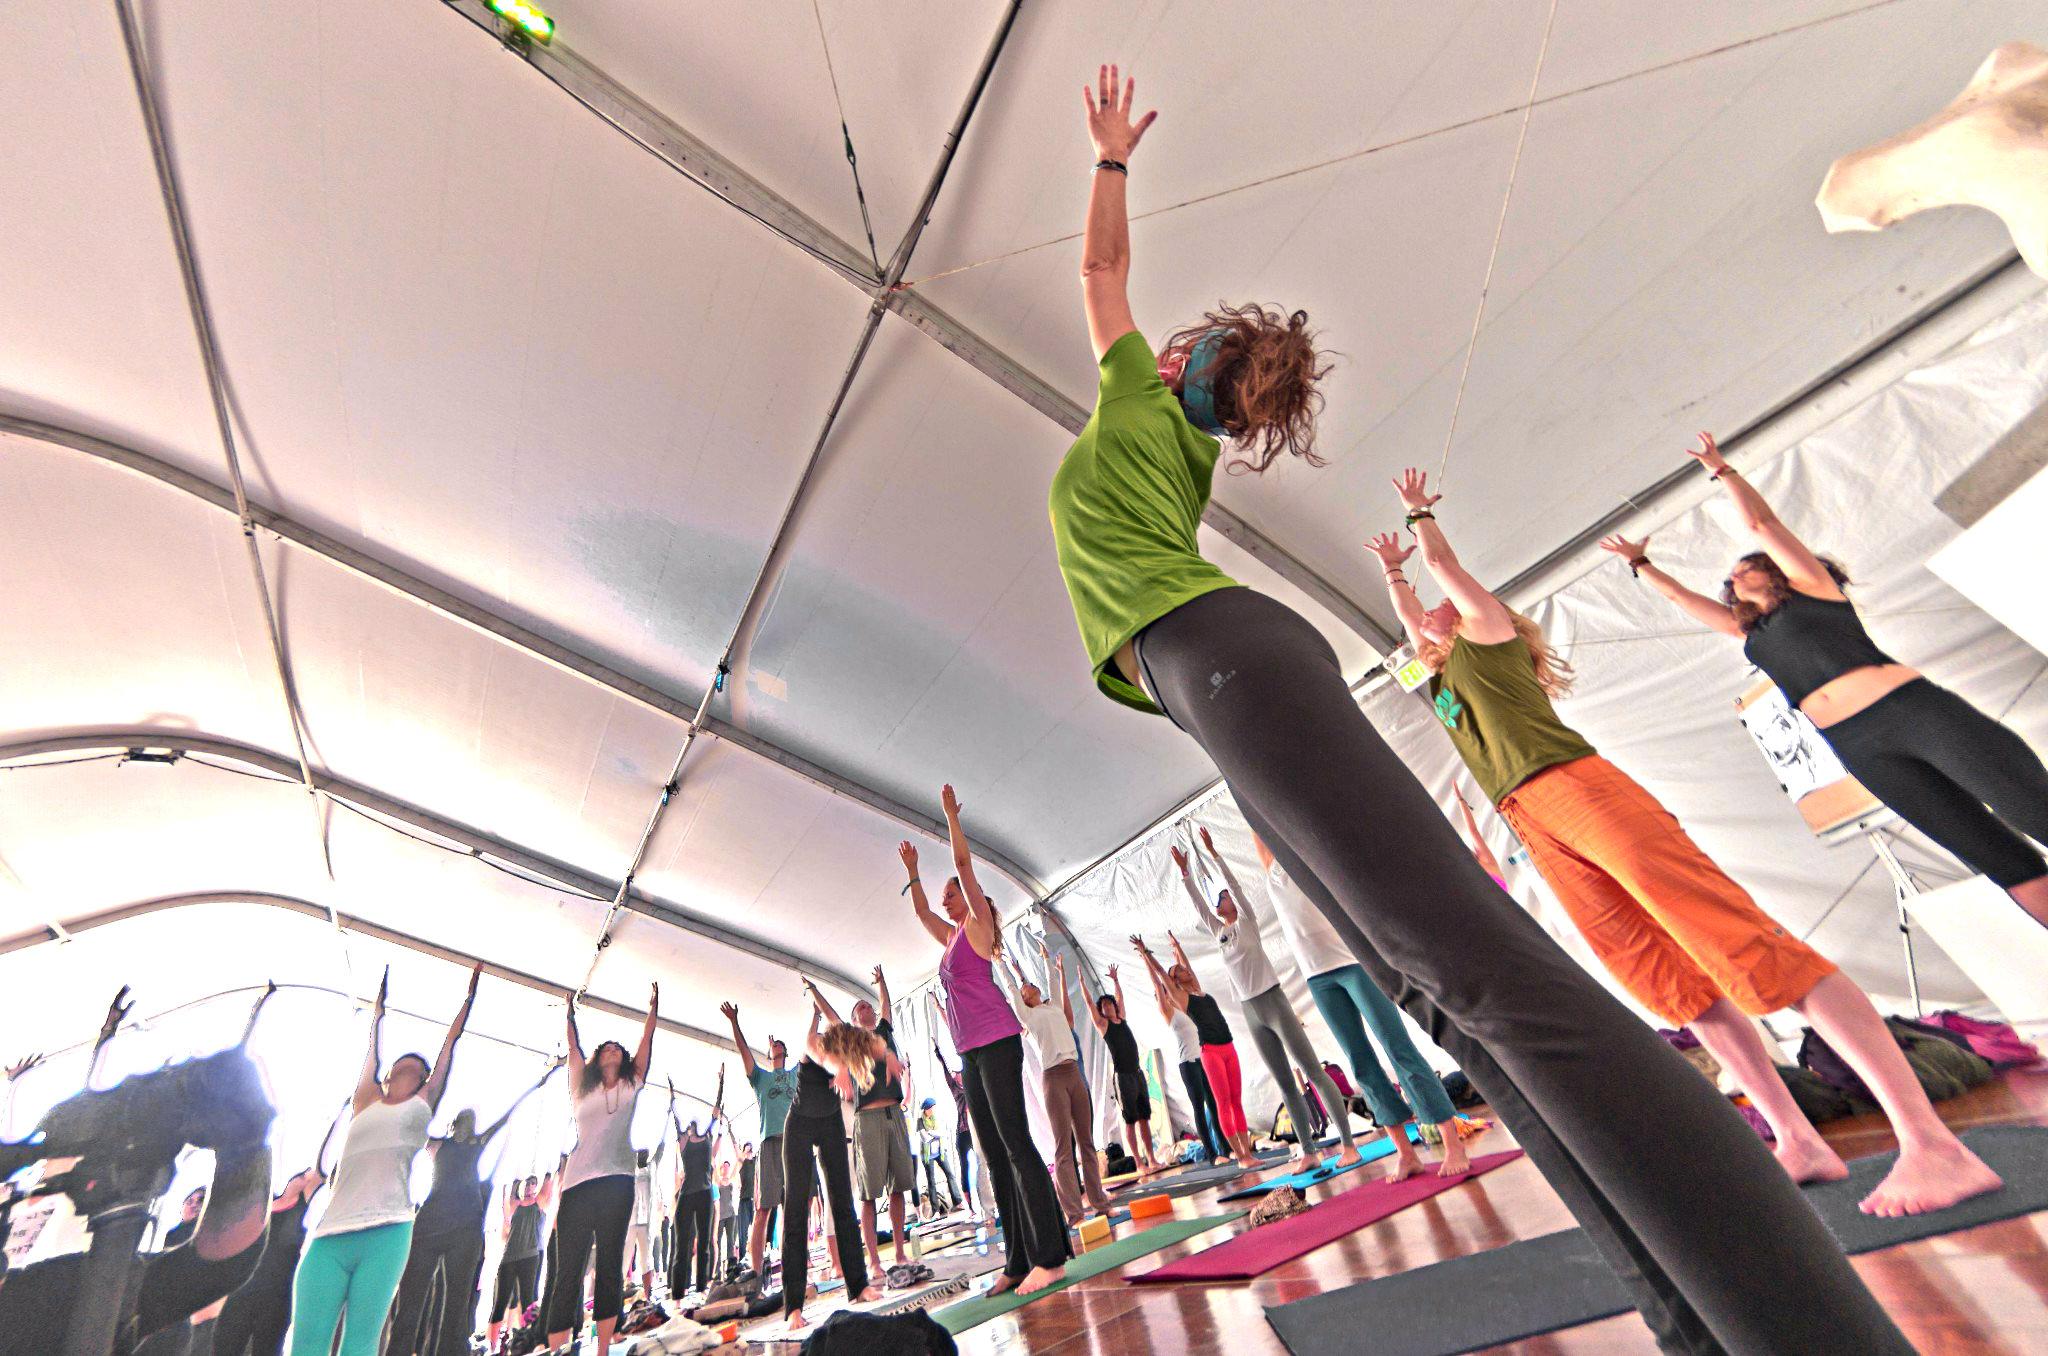 Quel Yoga est le mieux pour moi  Chaque style de yoga a ses bienfaits.  POWER YOGA YIN YOGA SIVANANDA ASHTANGA YOGA BIKRAM YOGA KUNDALINI YOGA  IYENGAR YOGA 6fa6d843d3a